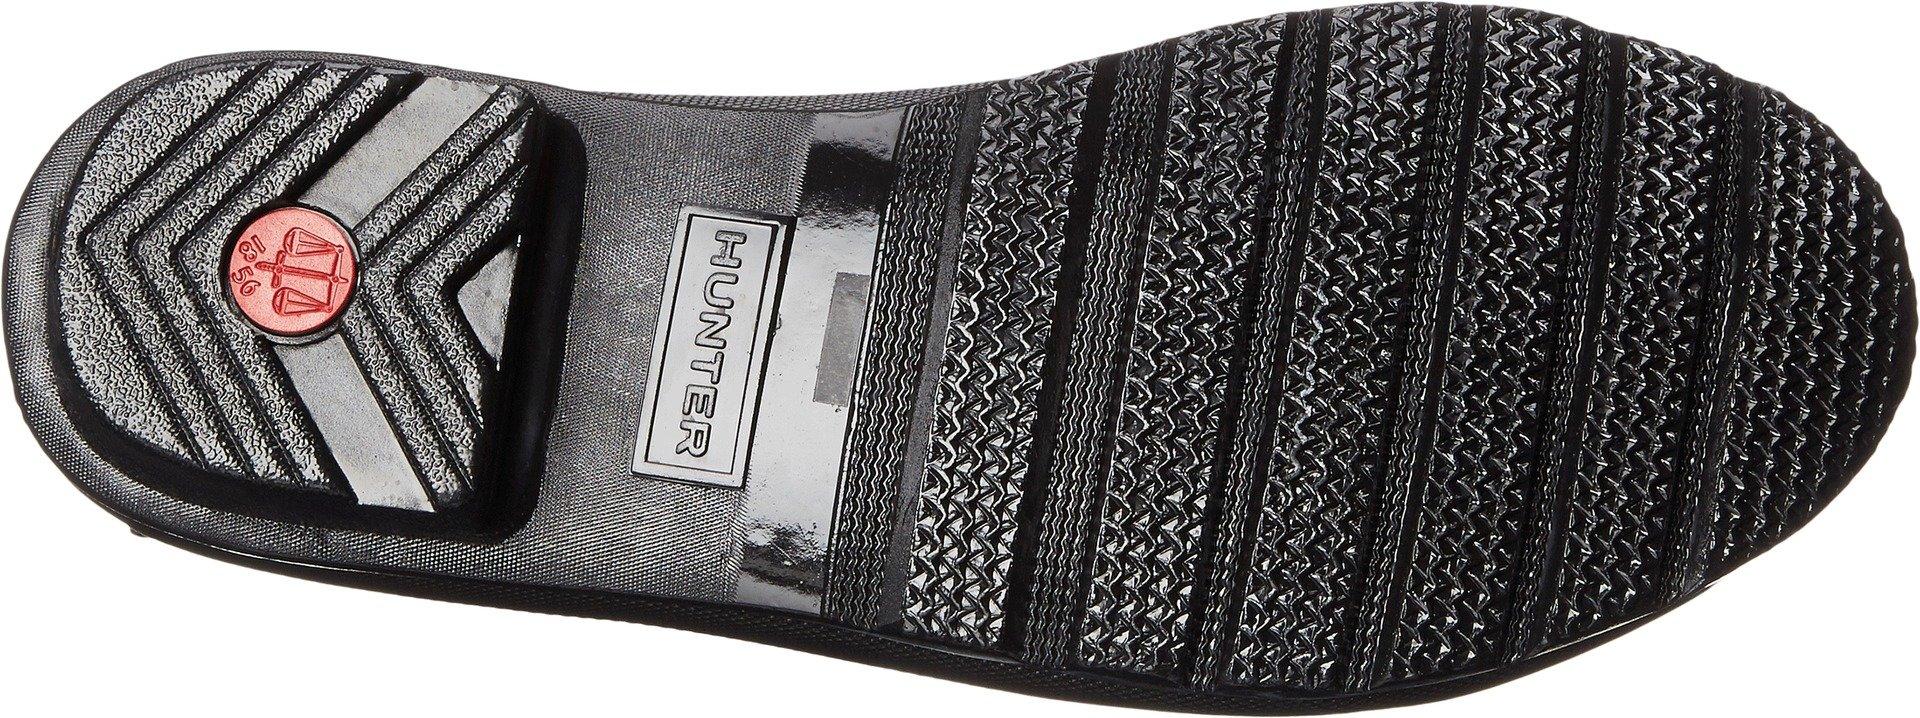 Hunter Boots Women's Original Chelsea Gloss Rain Boot Black 8 M US